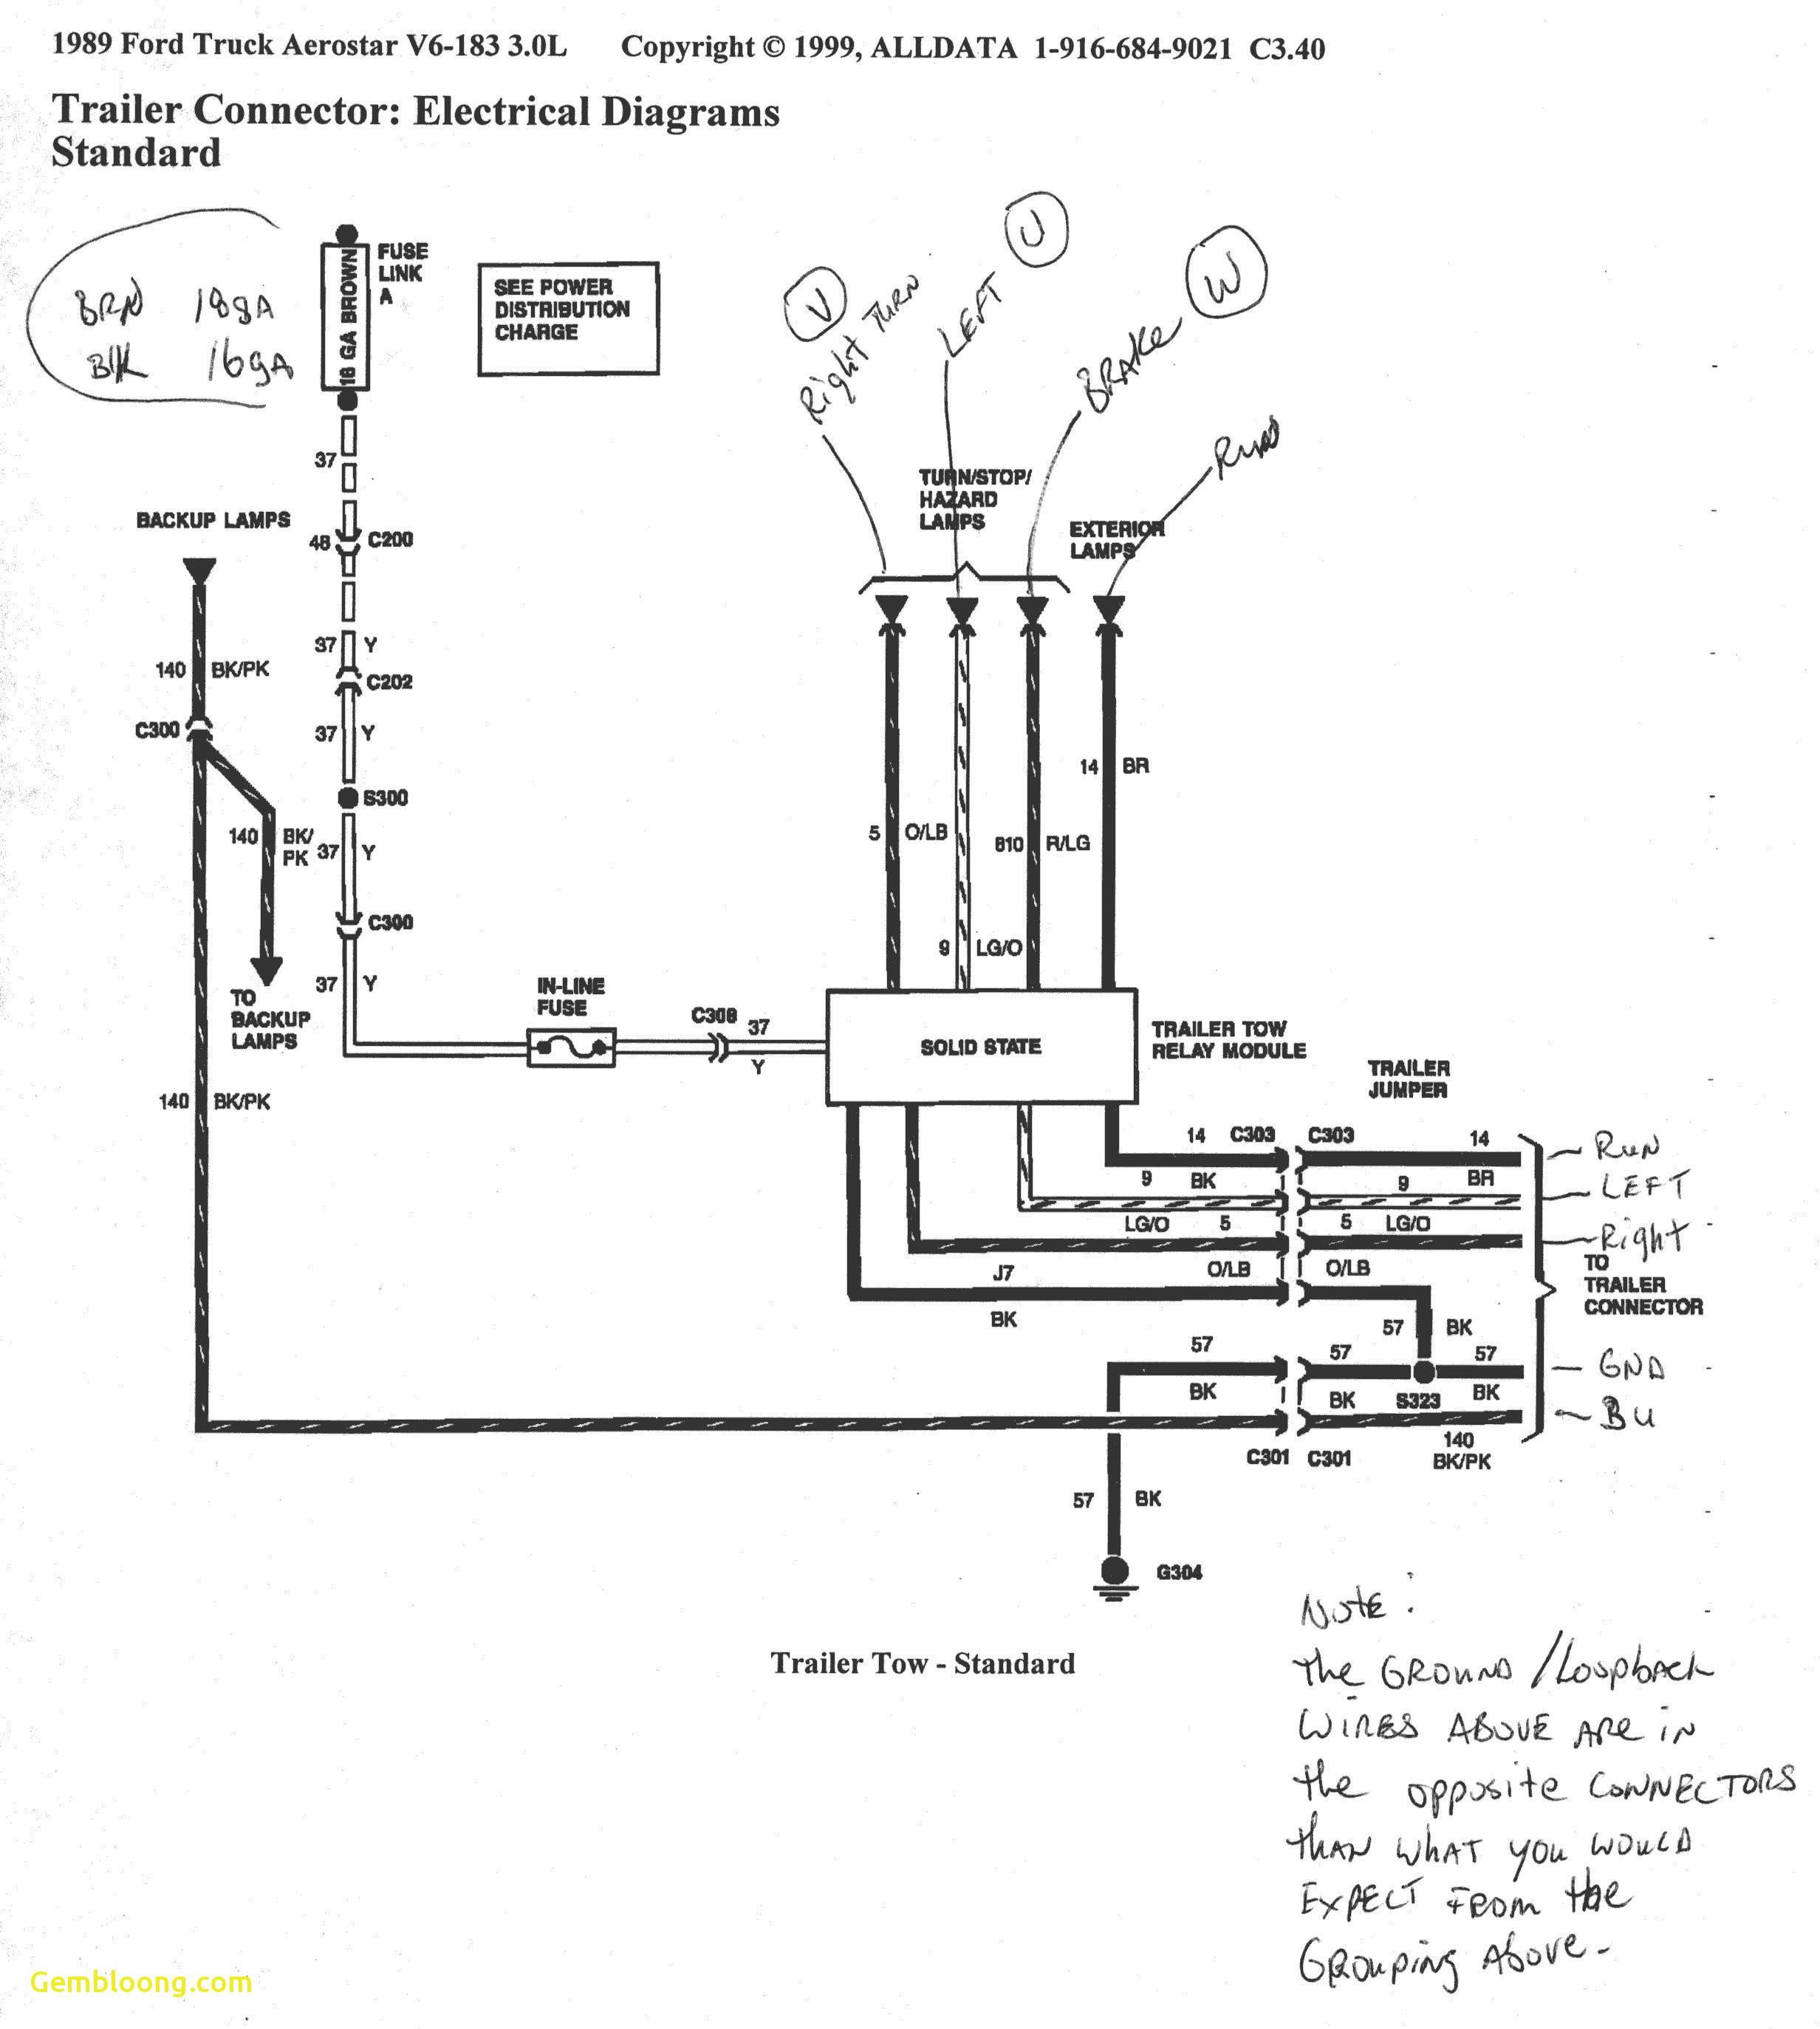 2002 Mercury Villager Distributor Inspirational 2005 Dodge Ram 1500 Tail Light Wiring Diagram Wiring Library